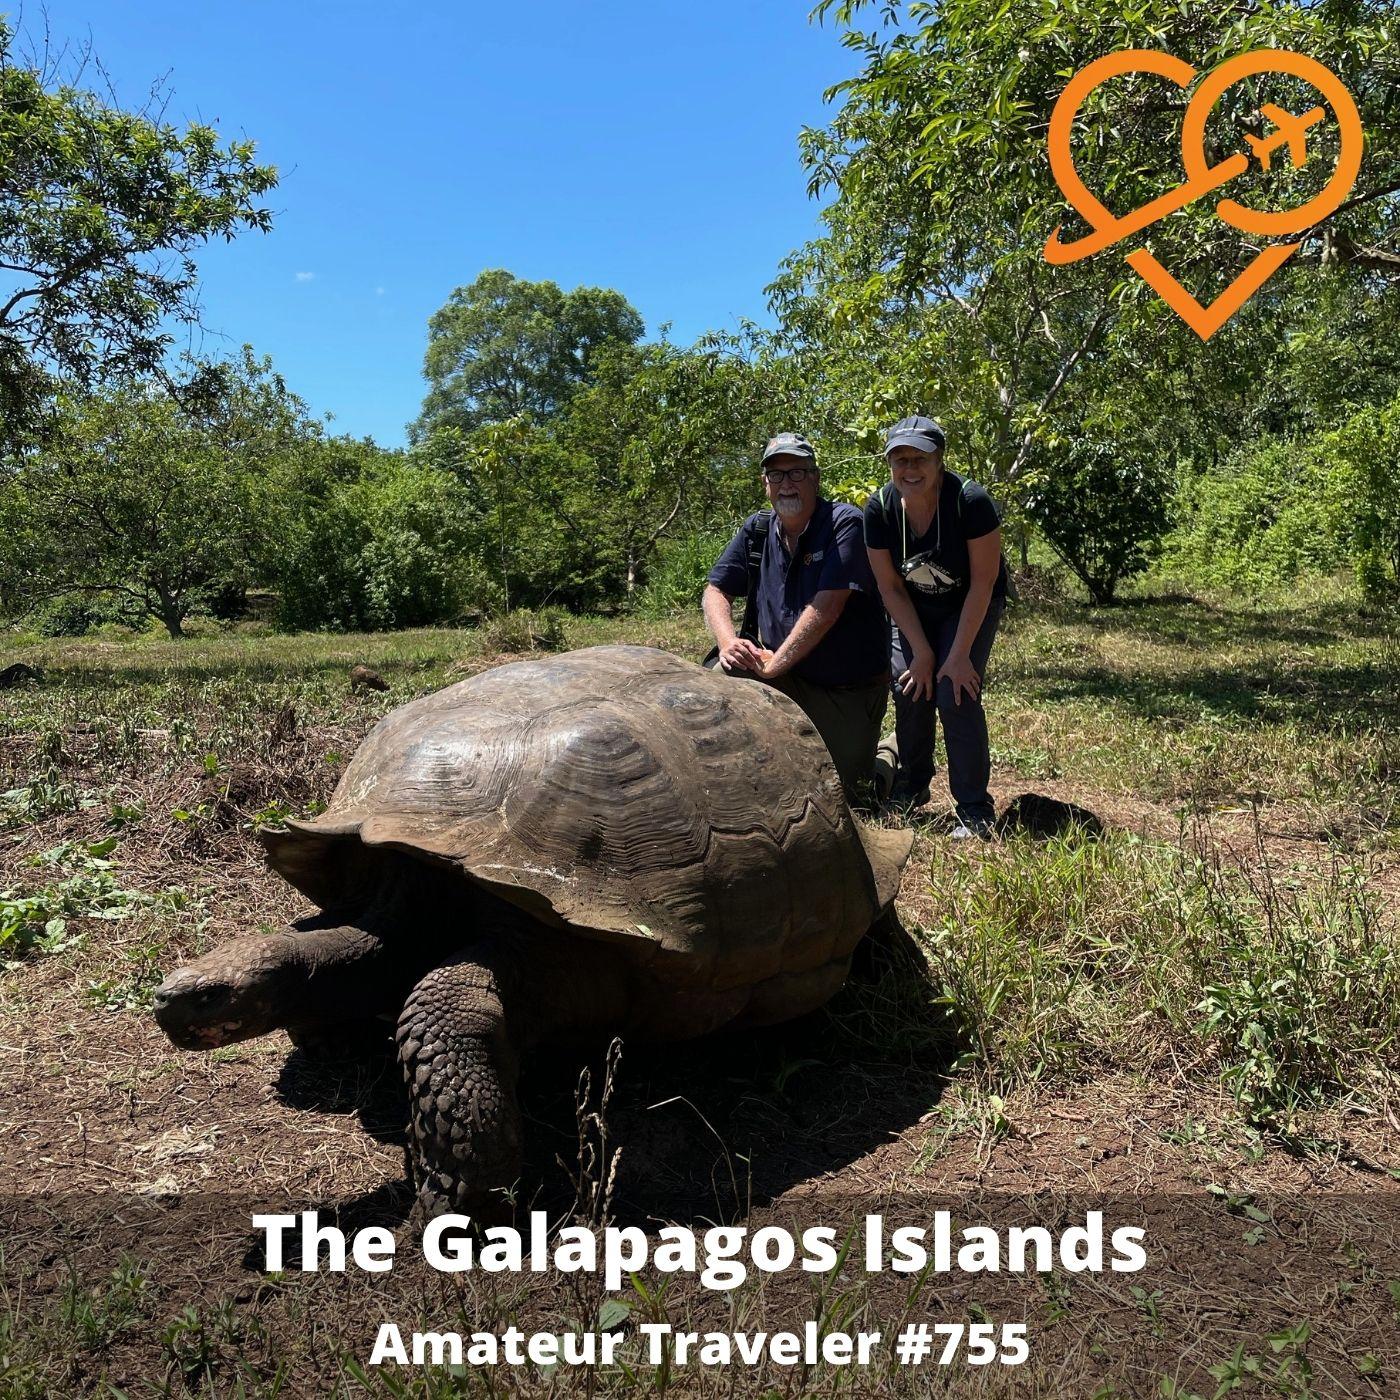 AT#755 - Travel to the Galapagos Islands, Ecuador